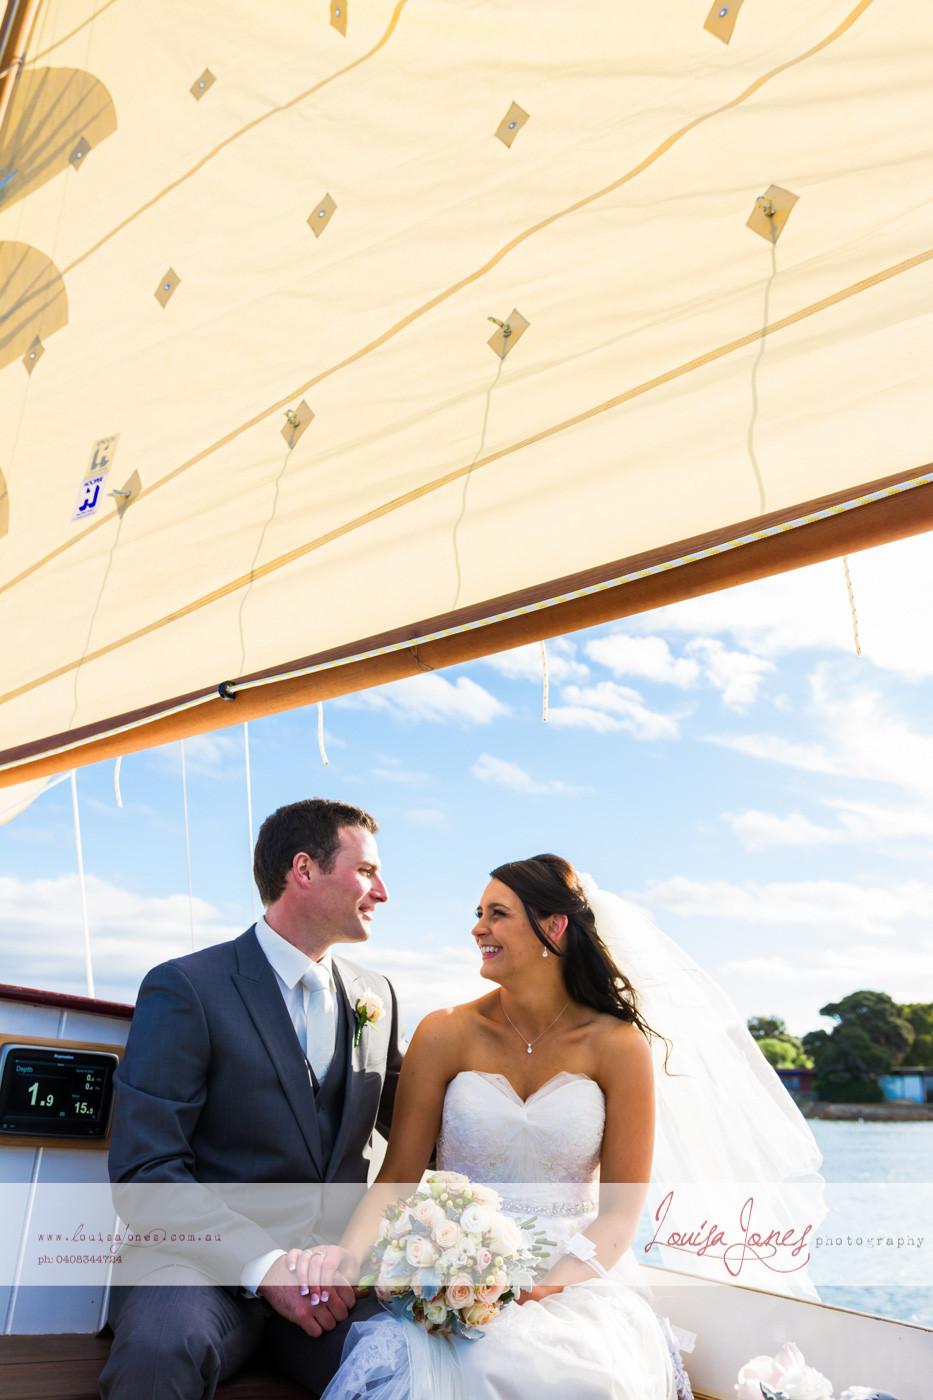 Geelong Surf Coast Wedding Photographer 083.jpg